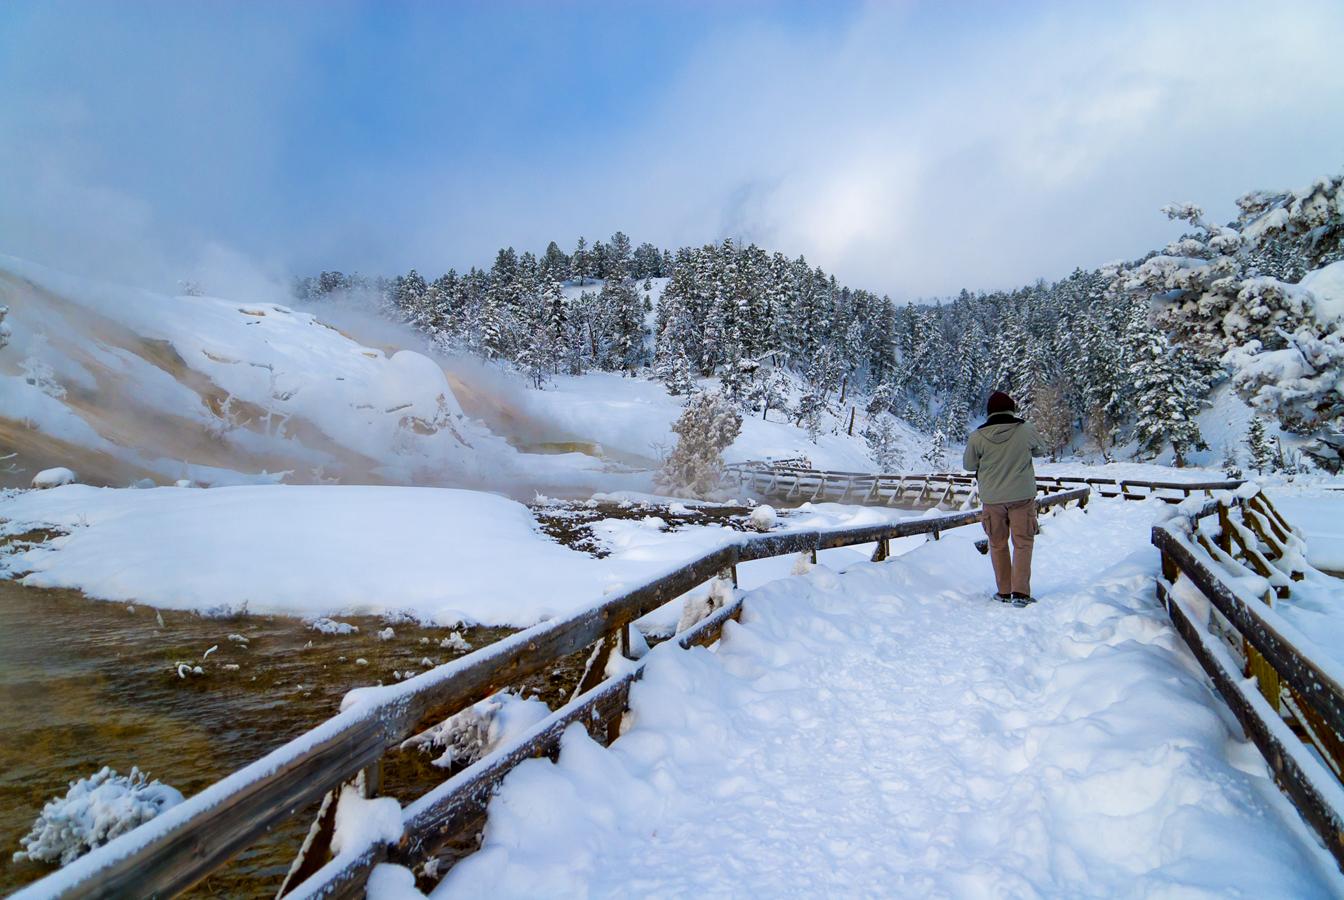 A man walks along a snowy trail